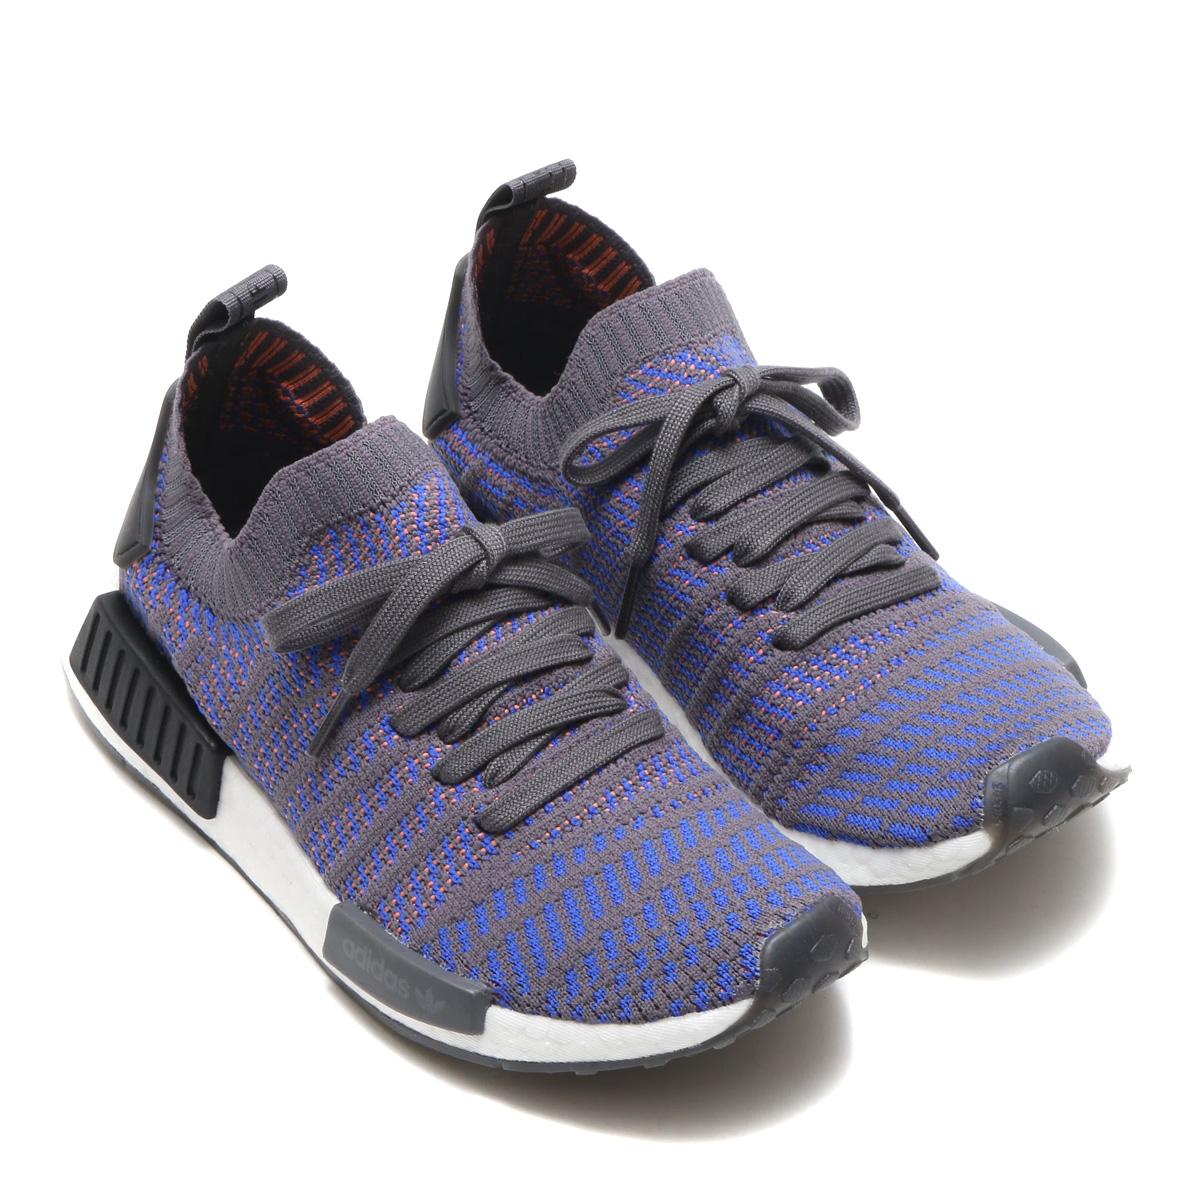 adidas Originals NMD R1 STLT PK Sneakers BlueBlack | Zando